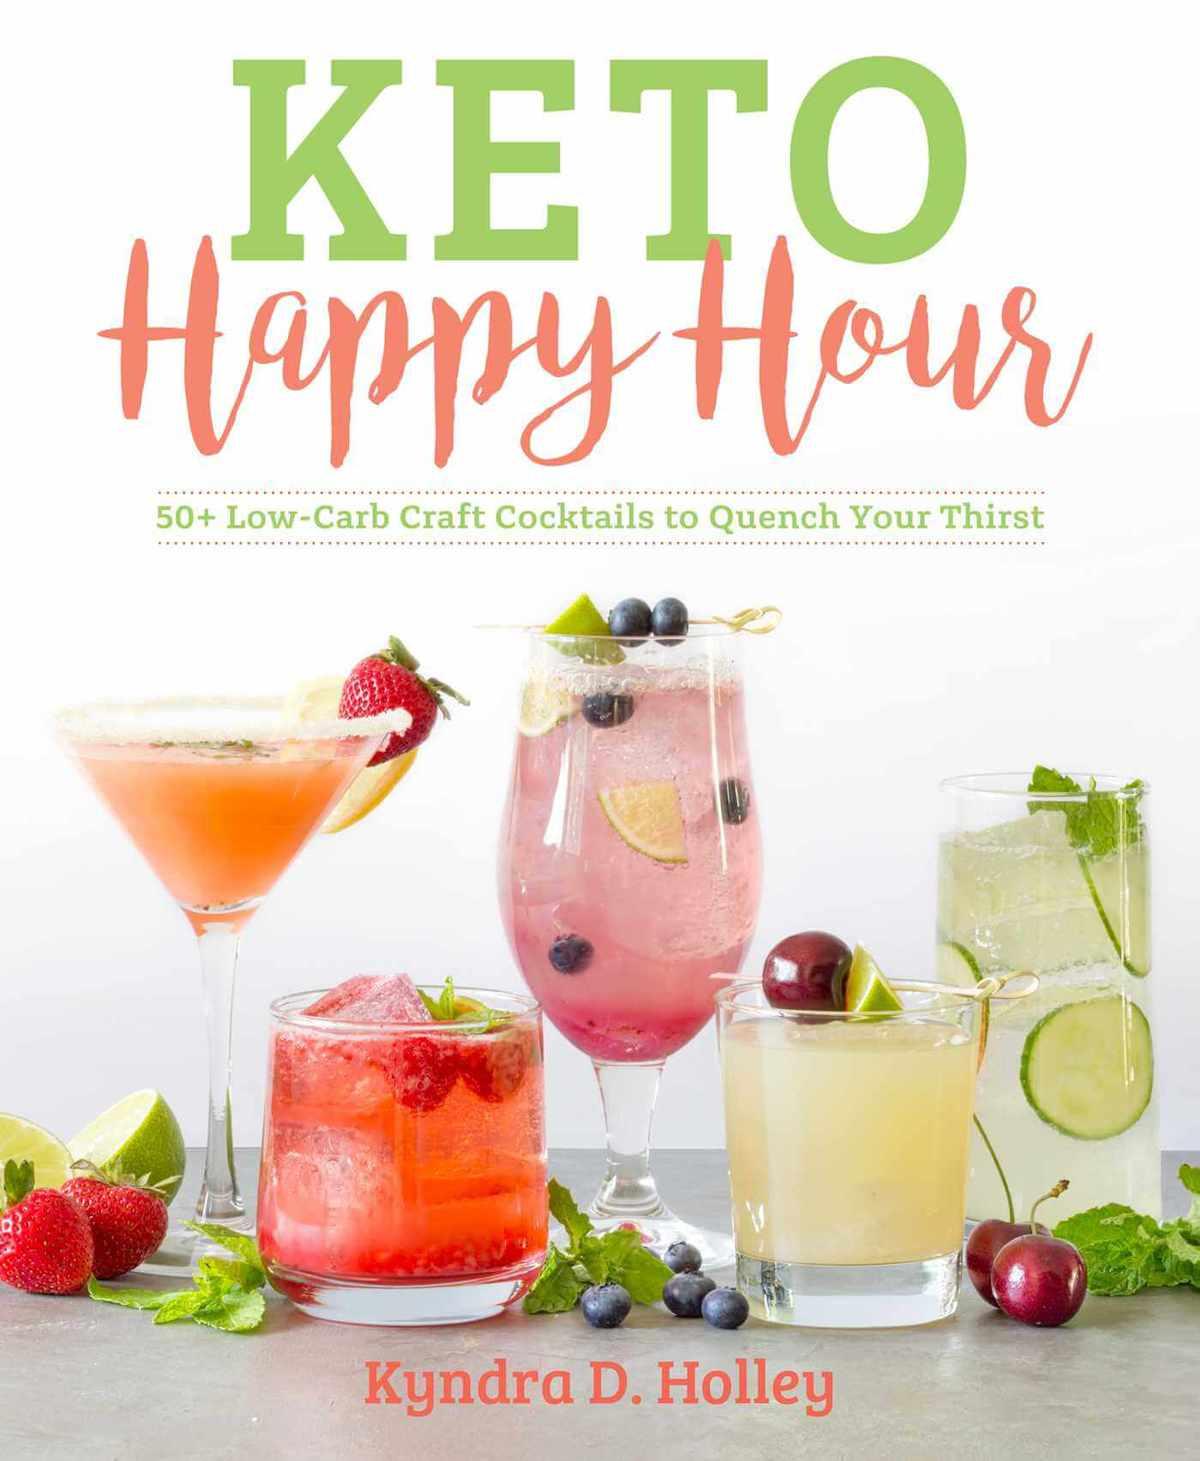 Top 10 Keto Books of 2018 - Keto Happy Hour